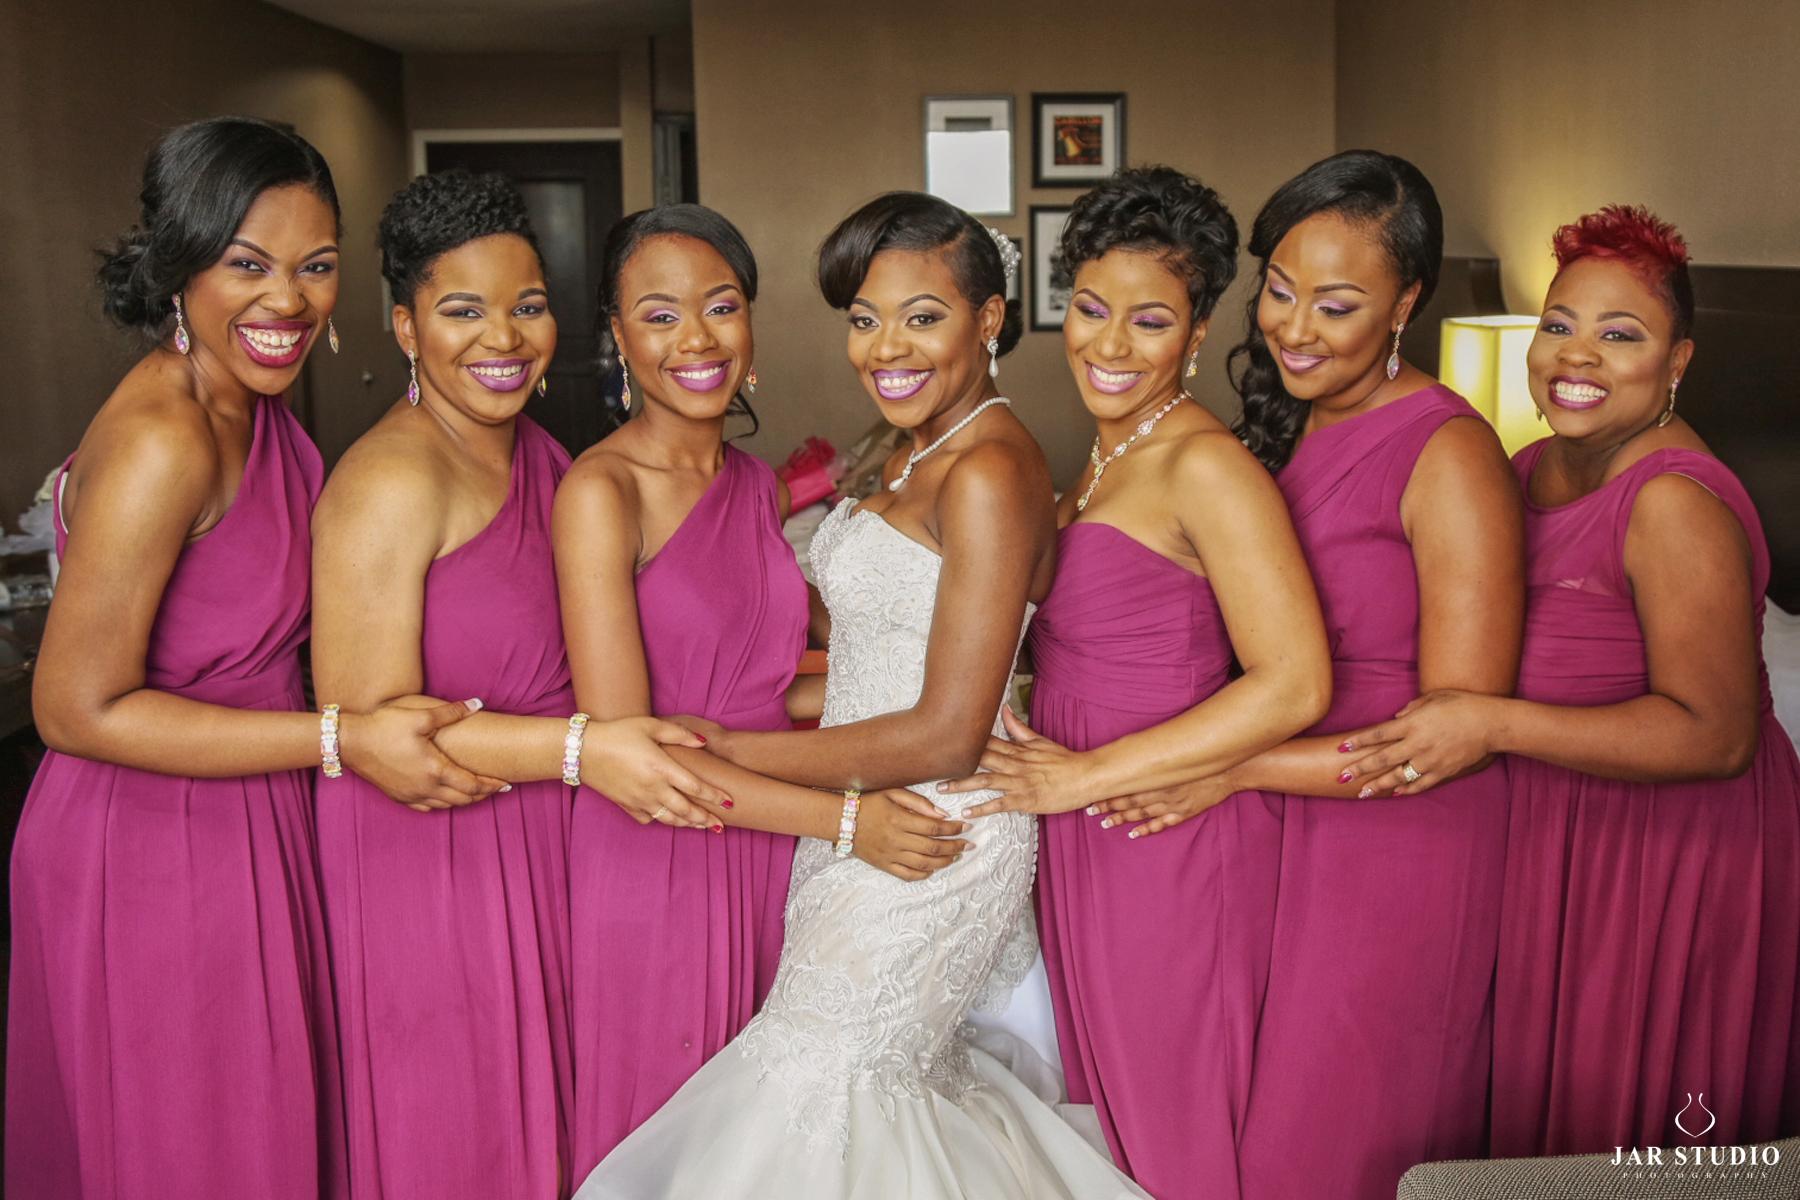 08-magenta-bridesmaid-dress-jarstudio-wedding-photographer.JPG